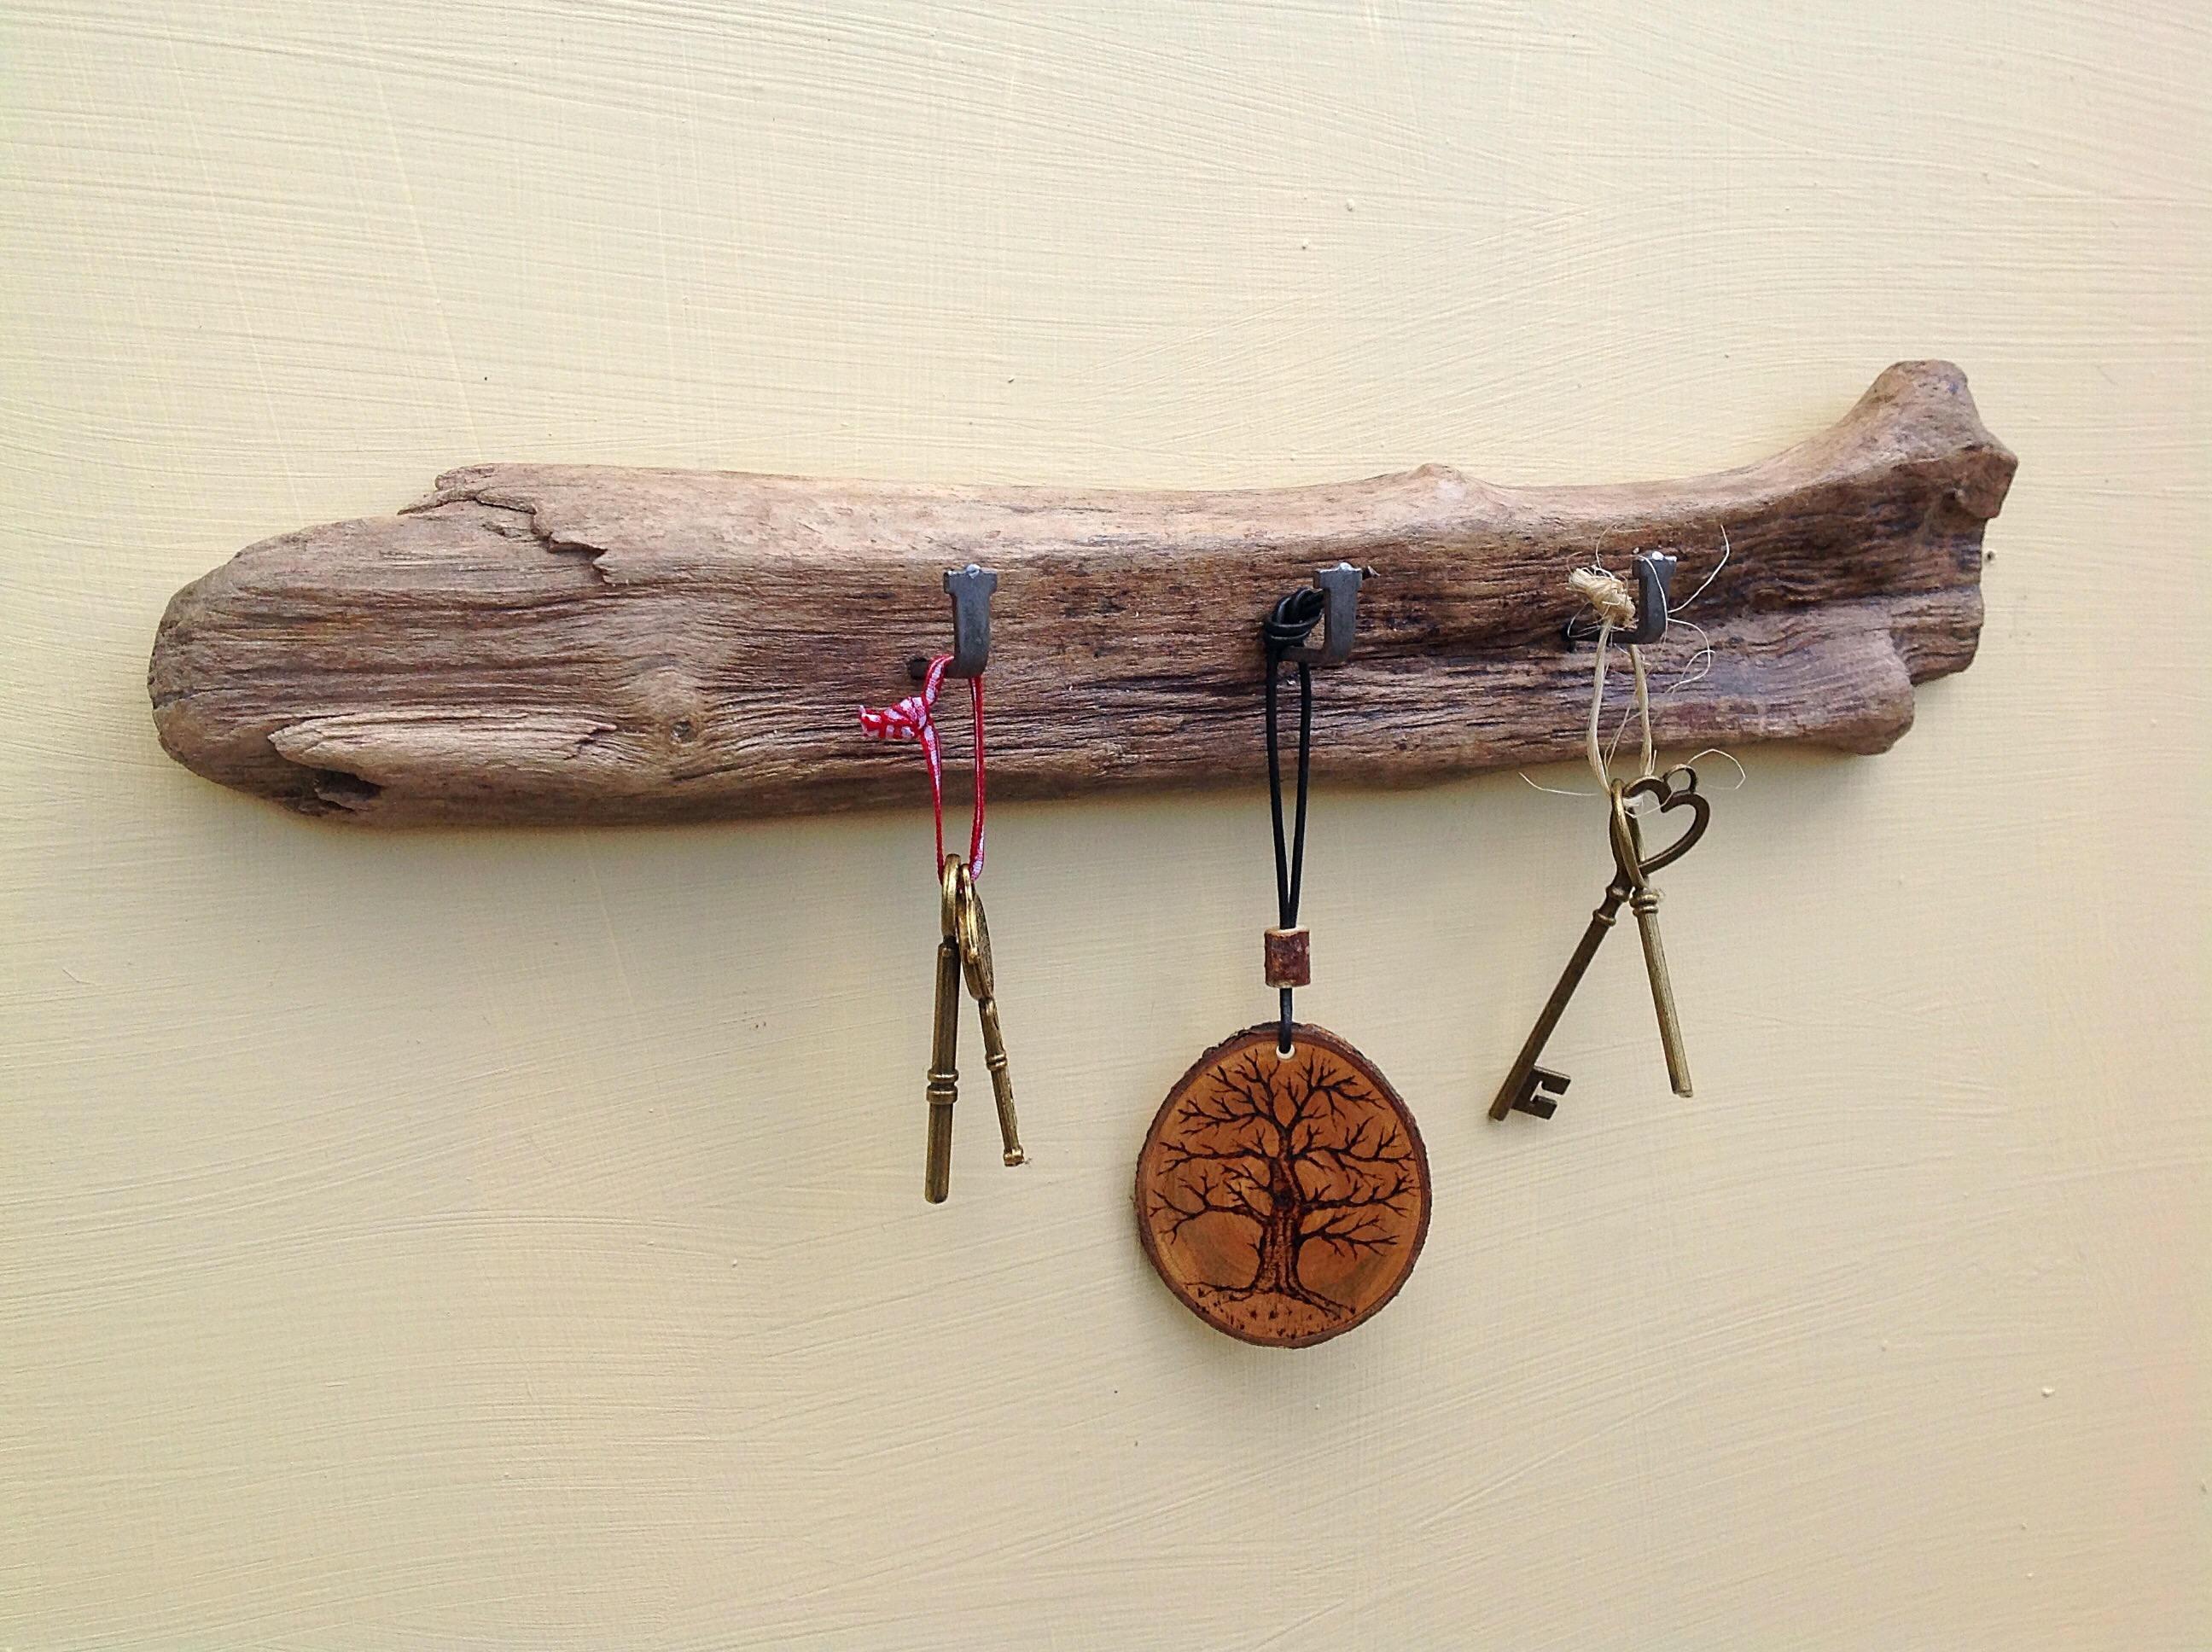 Driftwood key rack. Wall rack. 3 hooks. Drift wood hanging hooks for keys teatowels dog leads aprons... Beach decor key display holder